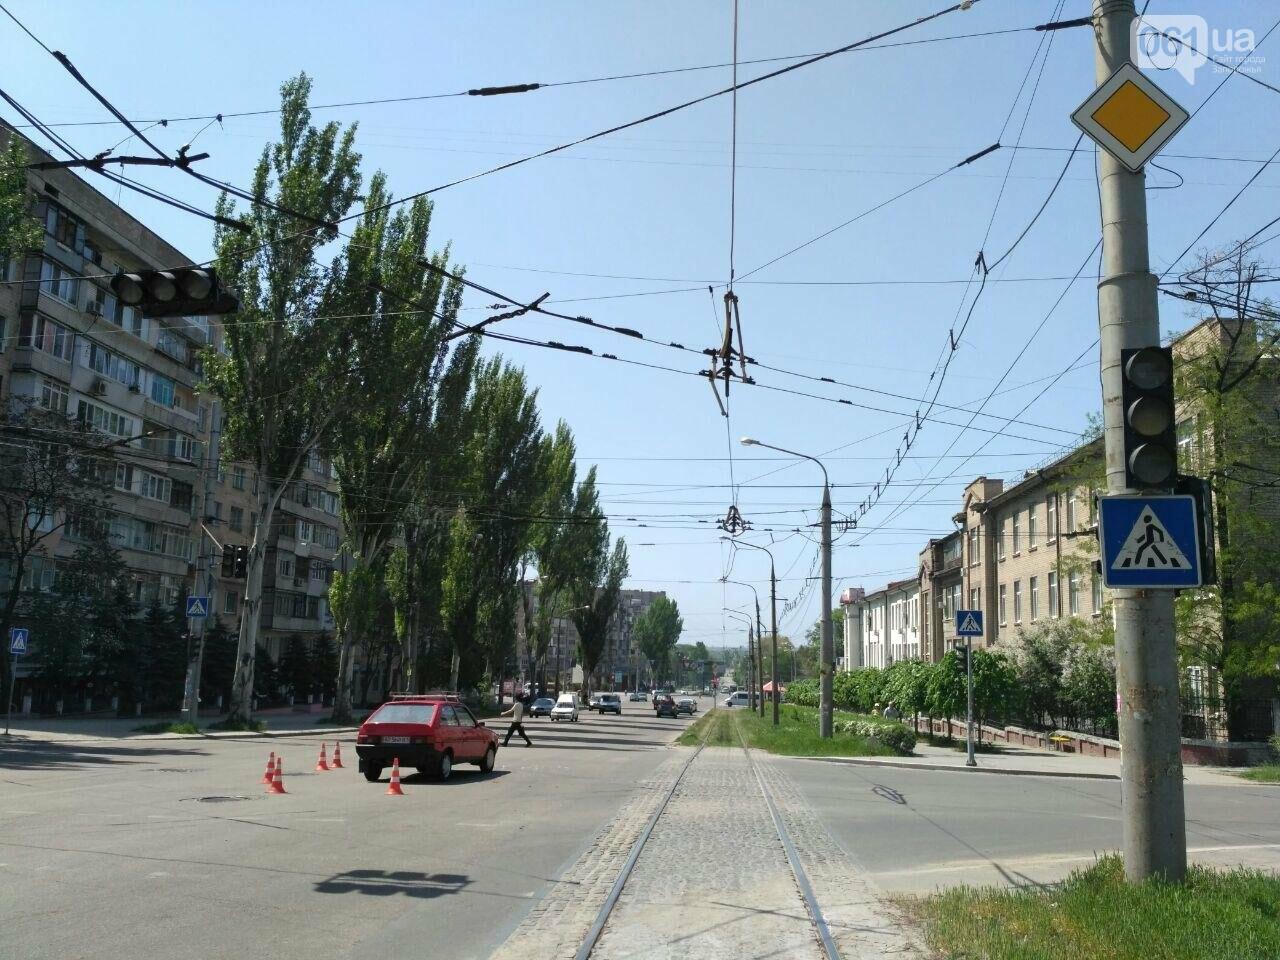 В центре Запорожья столкнулись ЗАЗ и TOYOTA, - ФОТО, фото-5